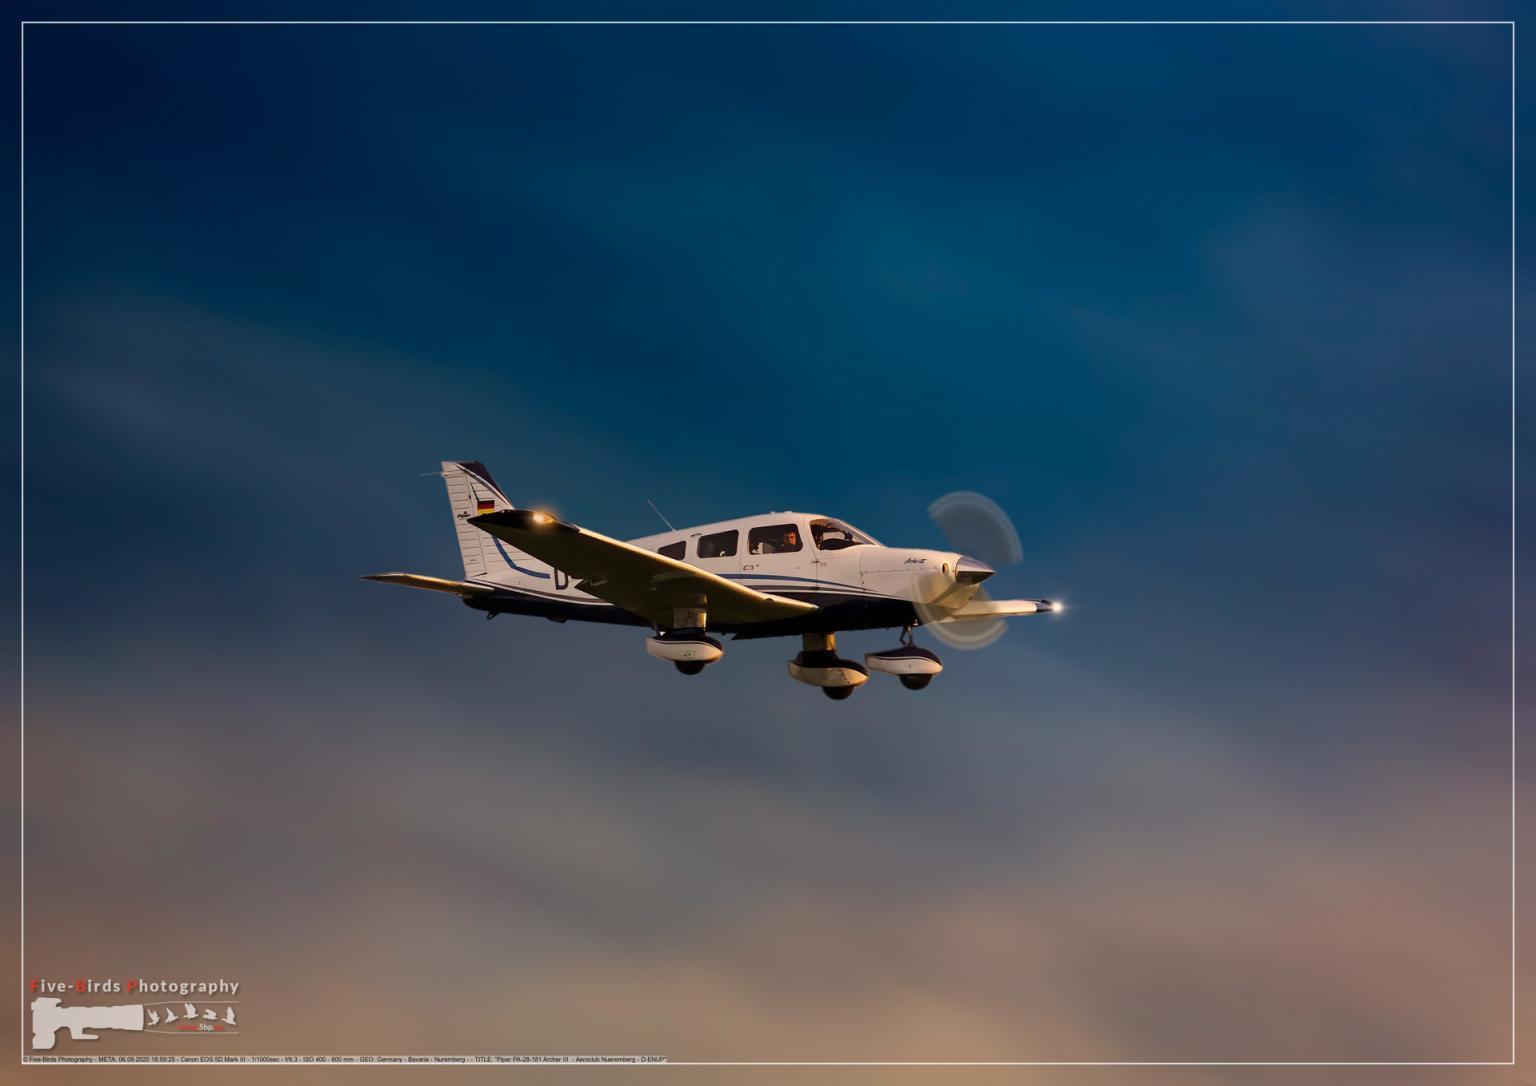 Piper PA-28-181 Archer III - Aeroclub Nueremberg - D-ENUP